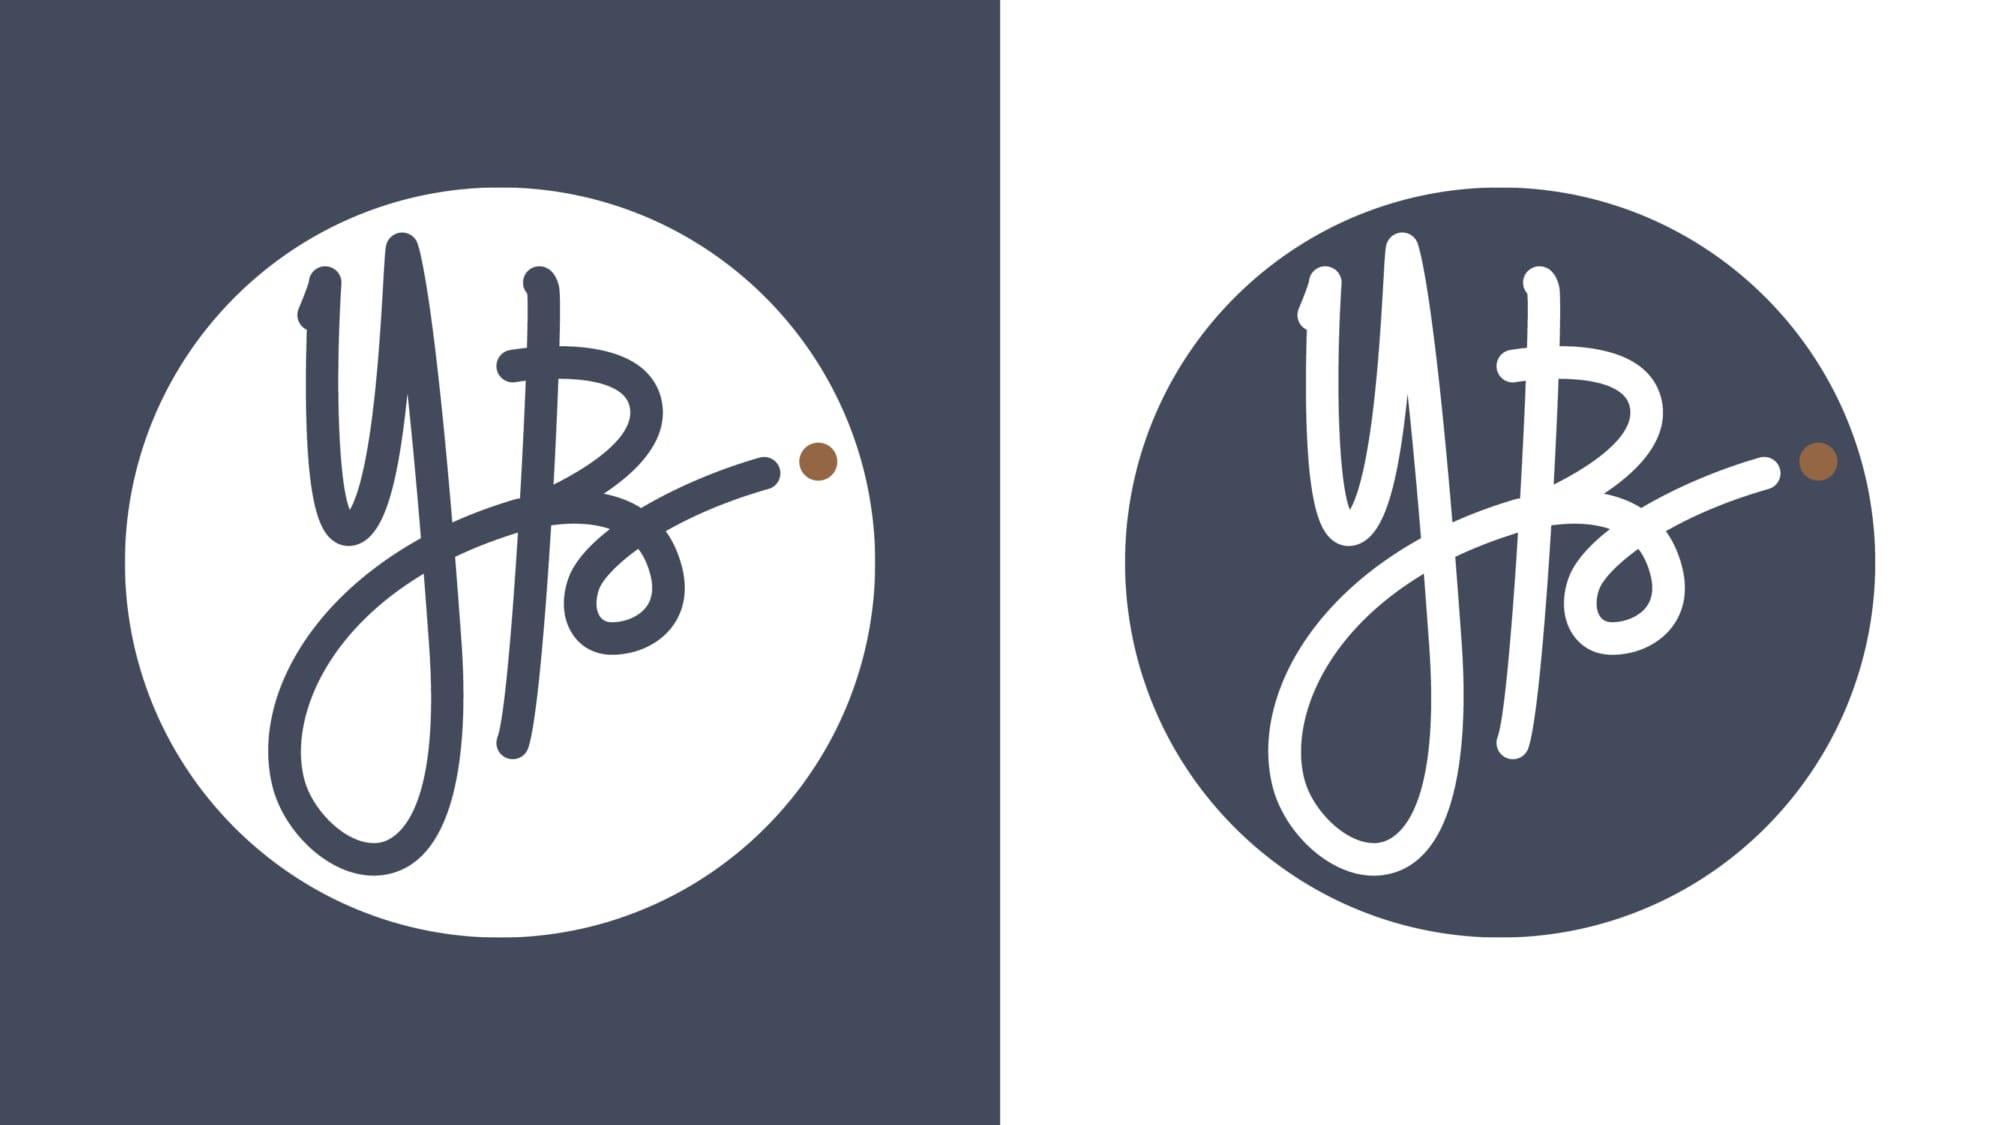 https://www.rednine.co.uk/wp-content/uploads/2019/07/YB-Logos4-300x169.jpg